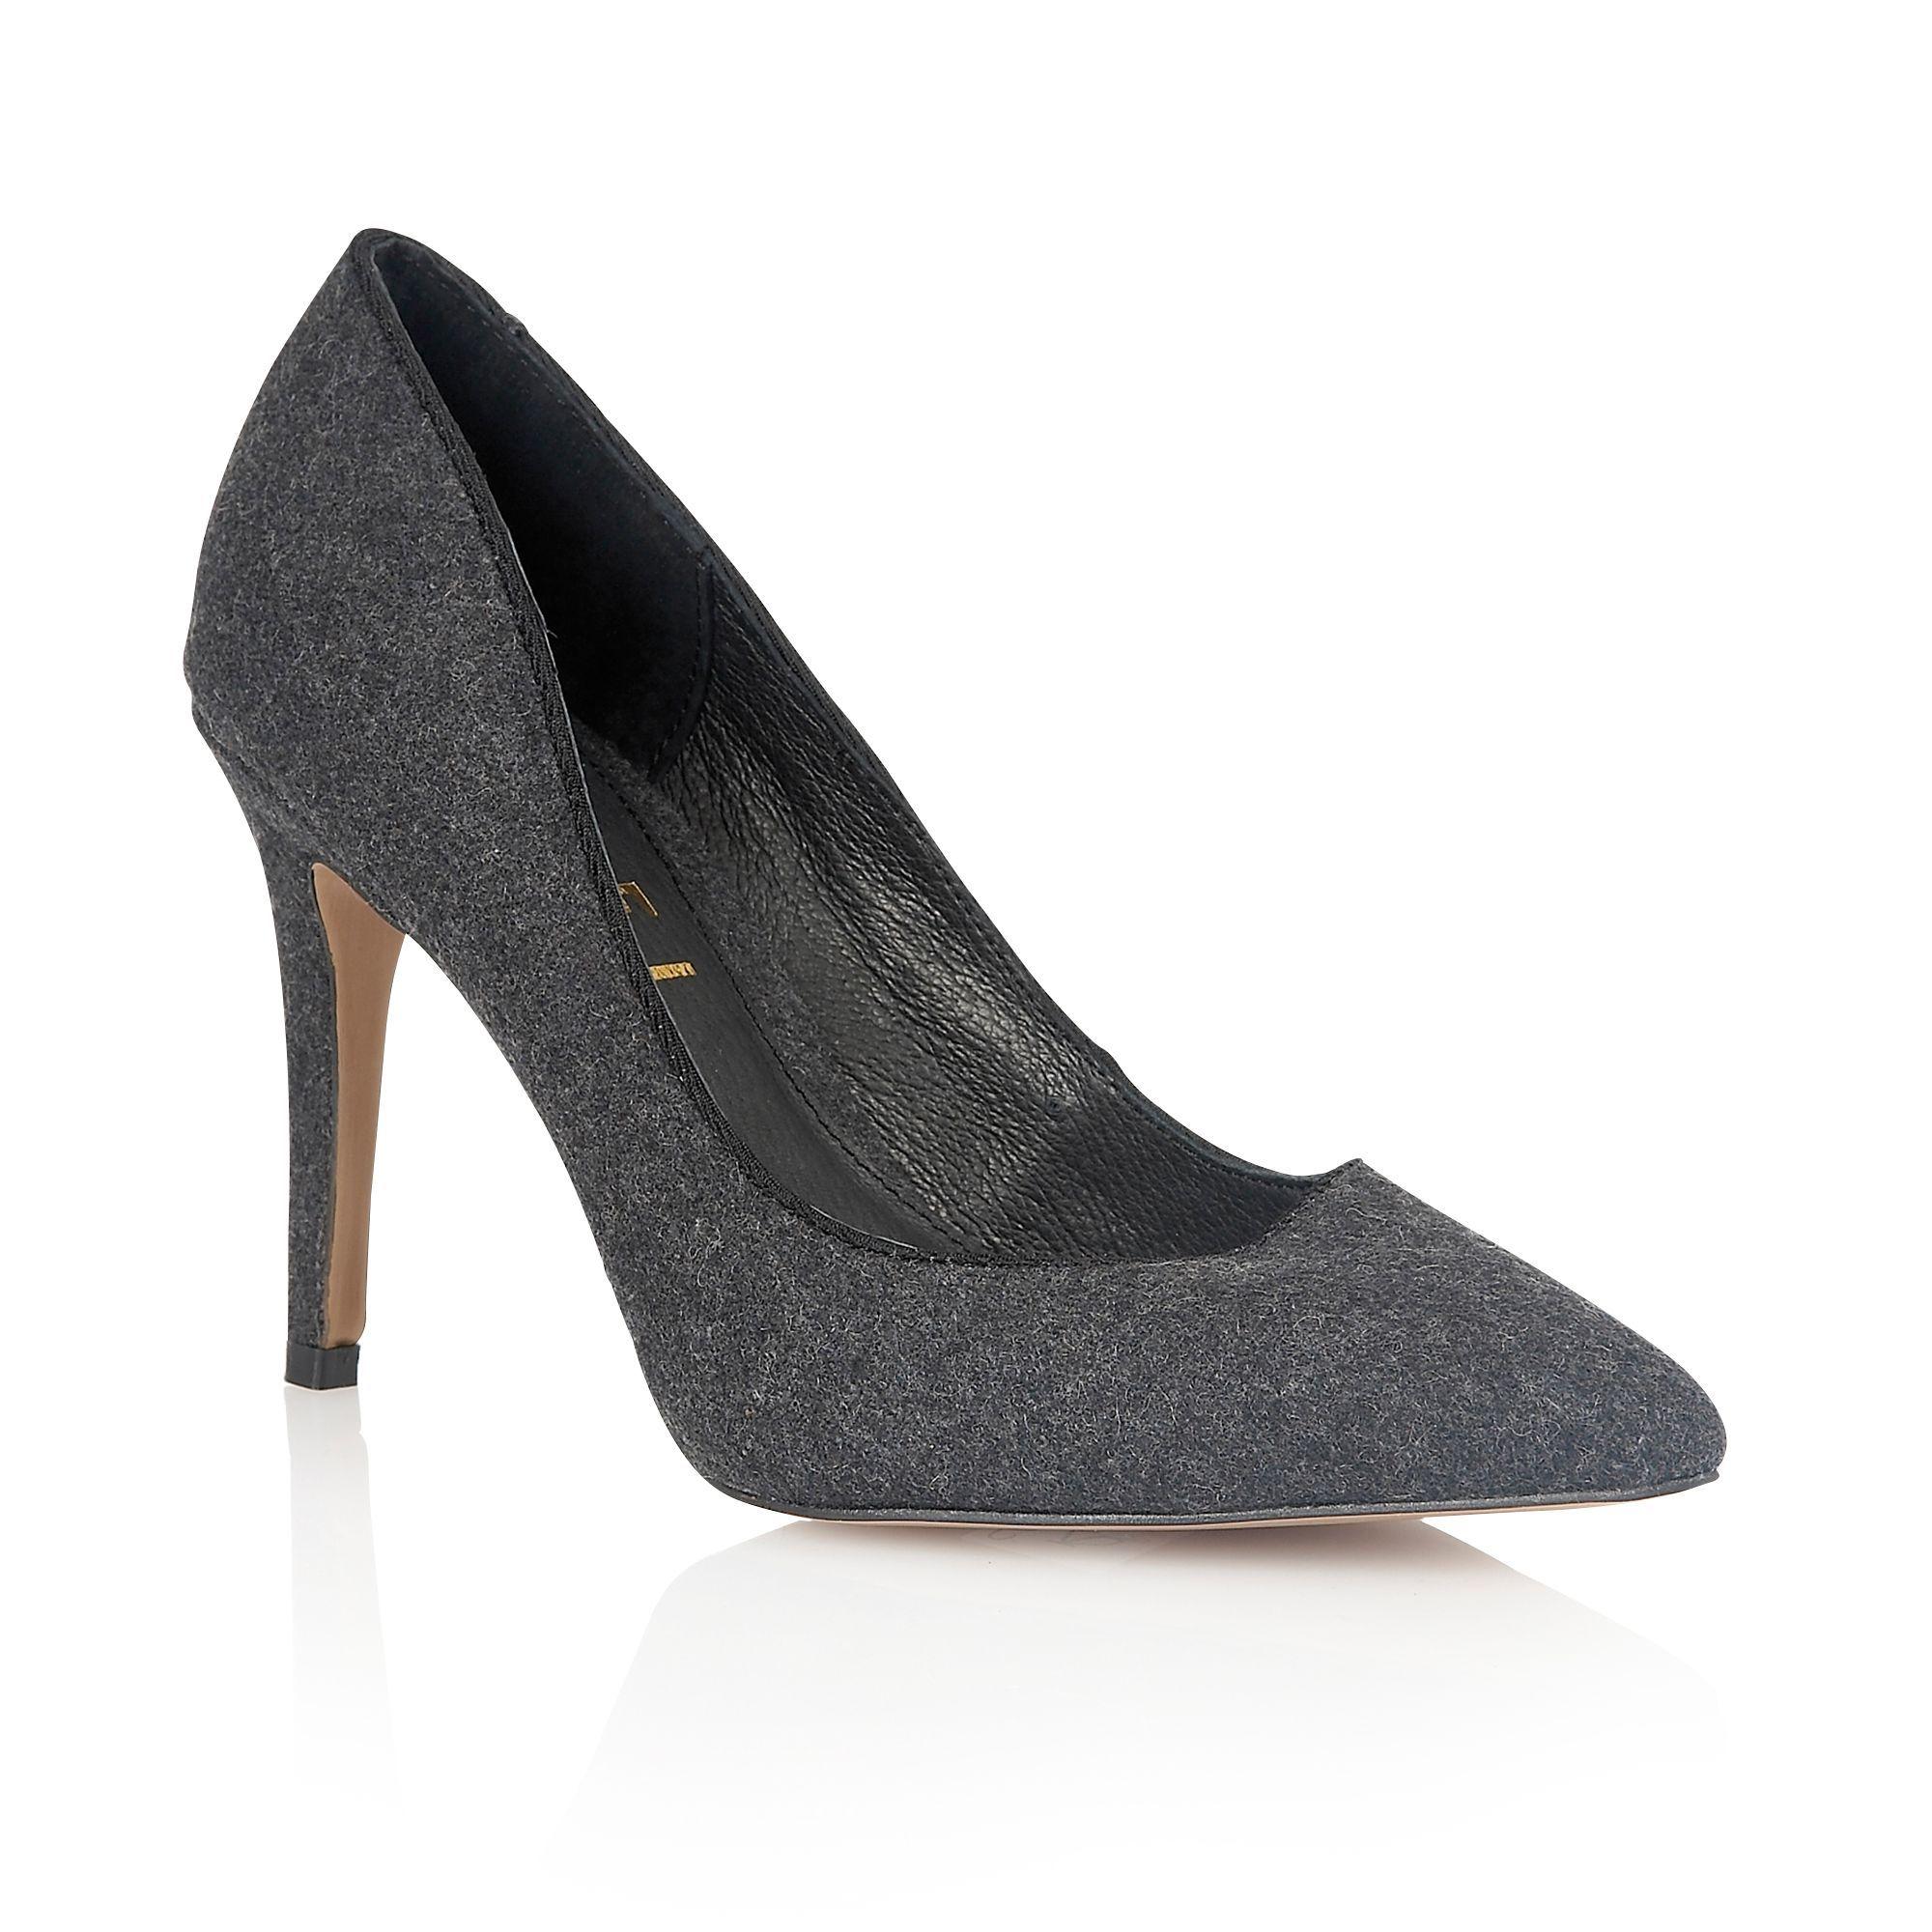 28bafed1db Ravel California heeled pumps, Charcoal | Ladies Shoes